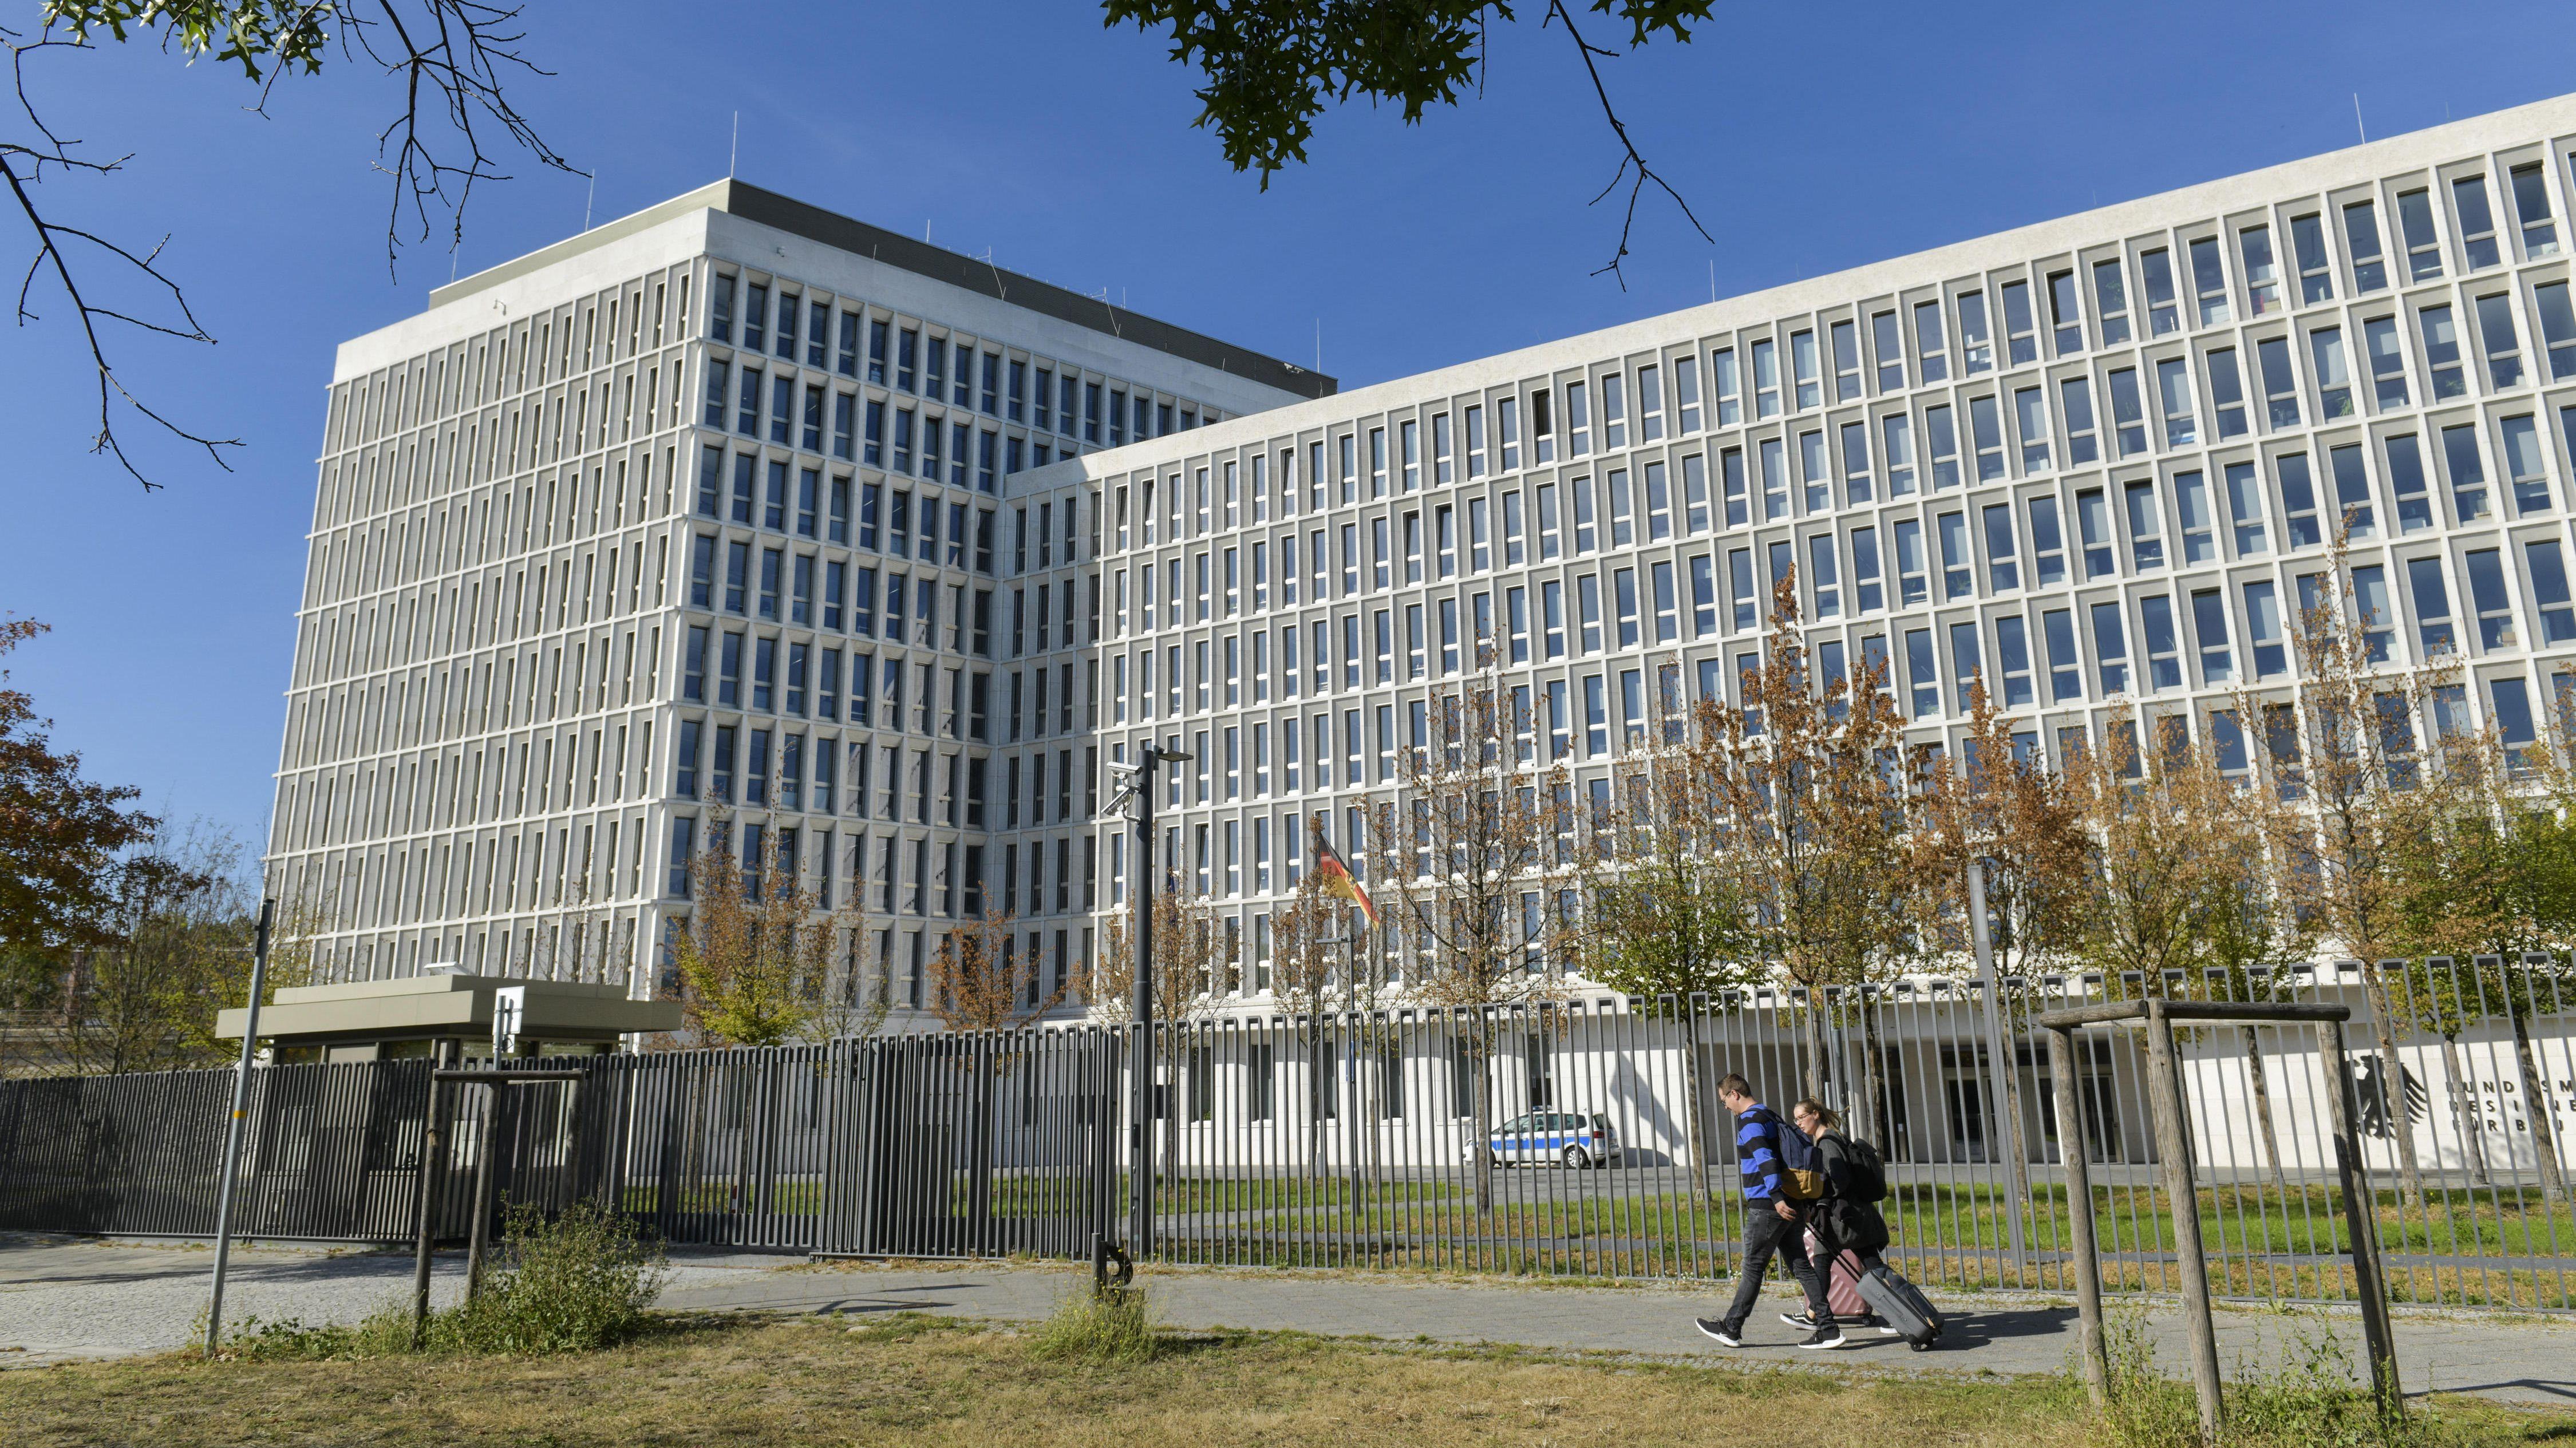 picture alliance / Bildagentur-online/Schoening